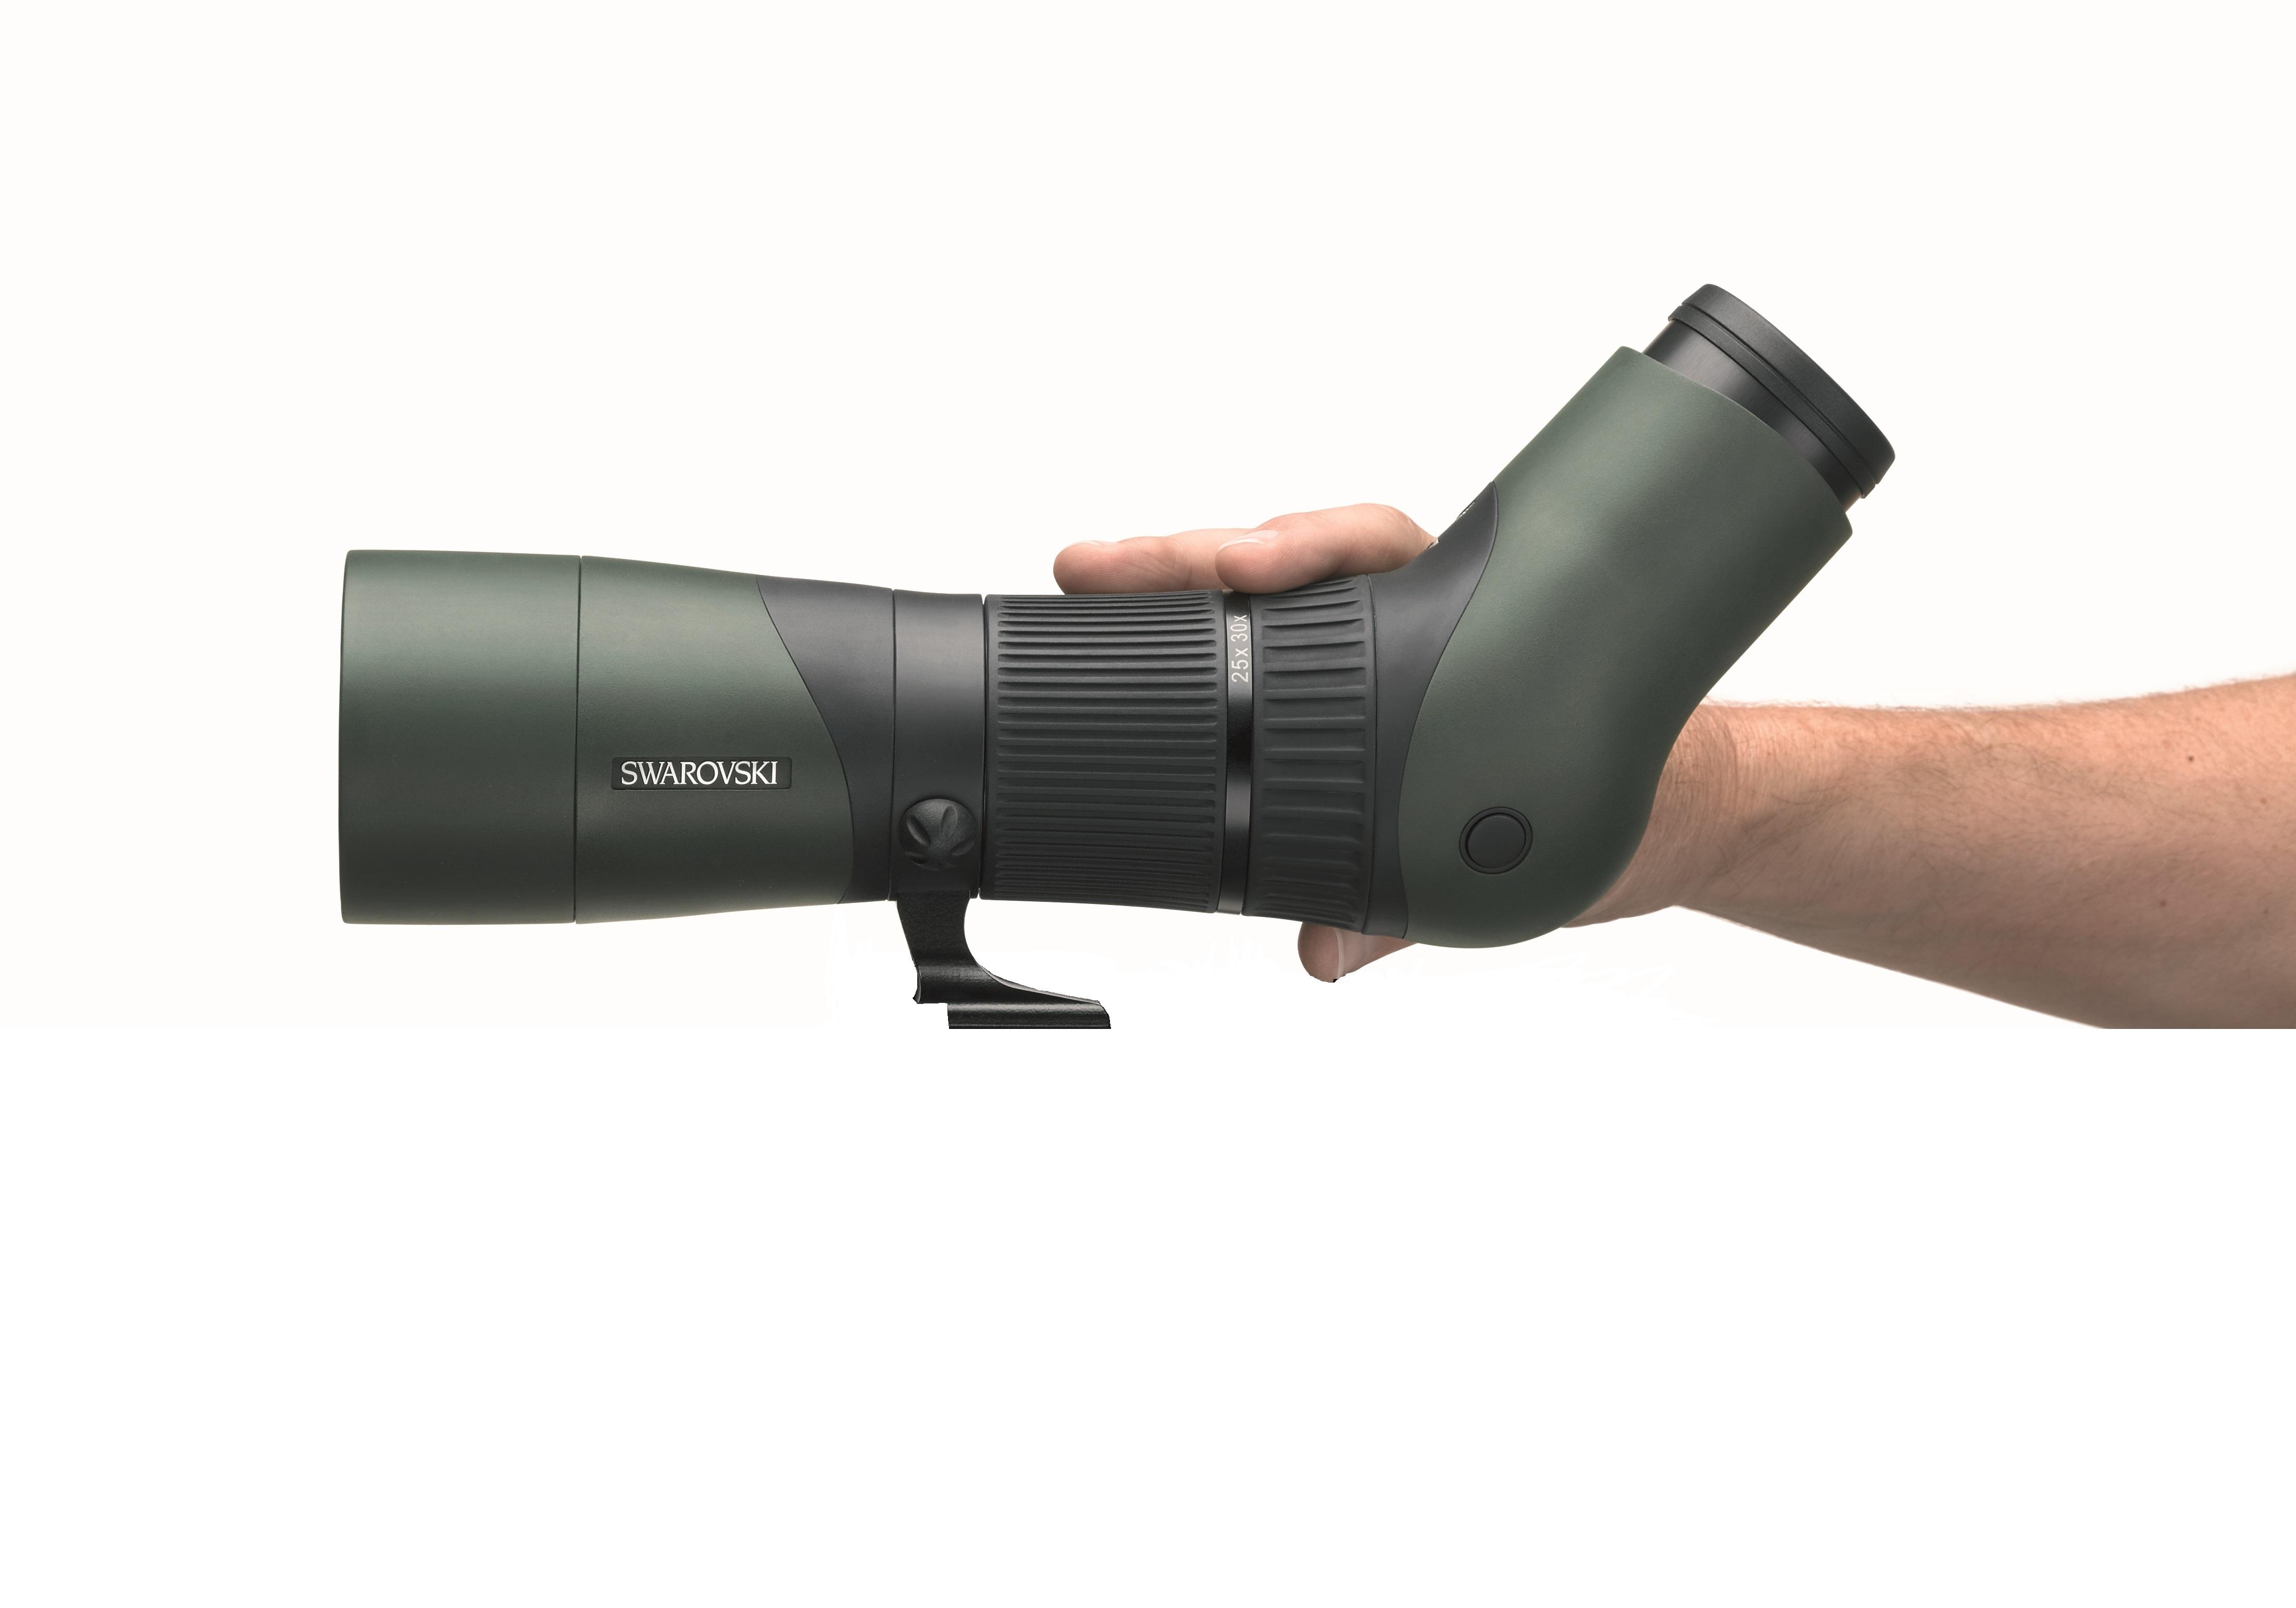 Swarovski Mit Entfernungsmesser : Swarovski optik ferngläser el range